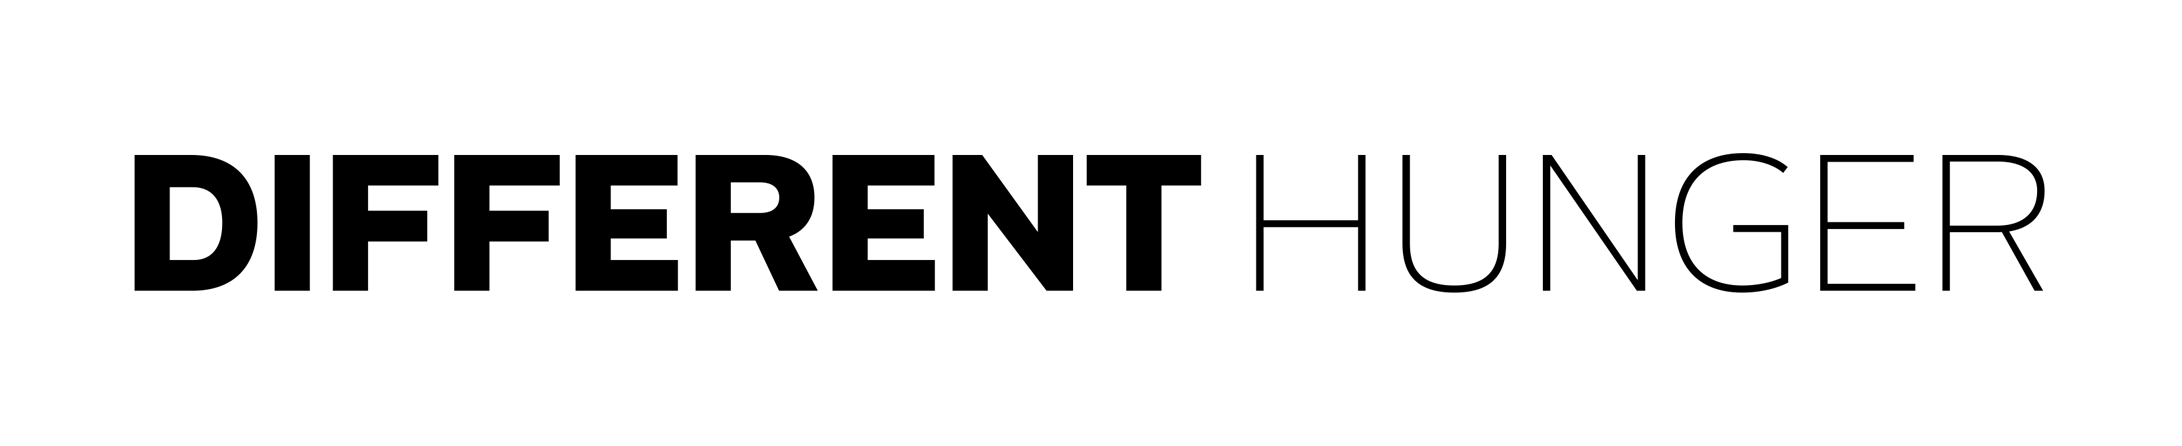 Logo - Black -- White.png